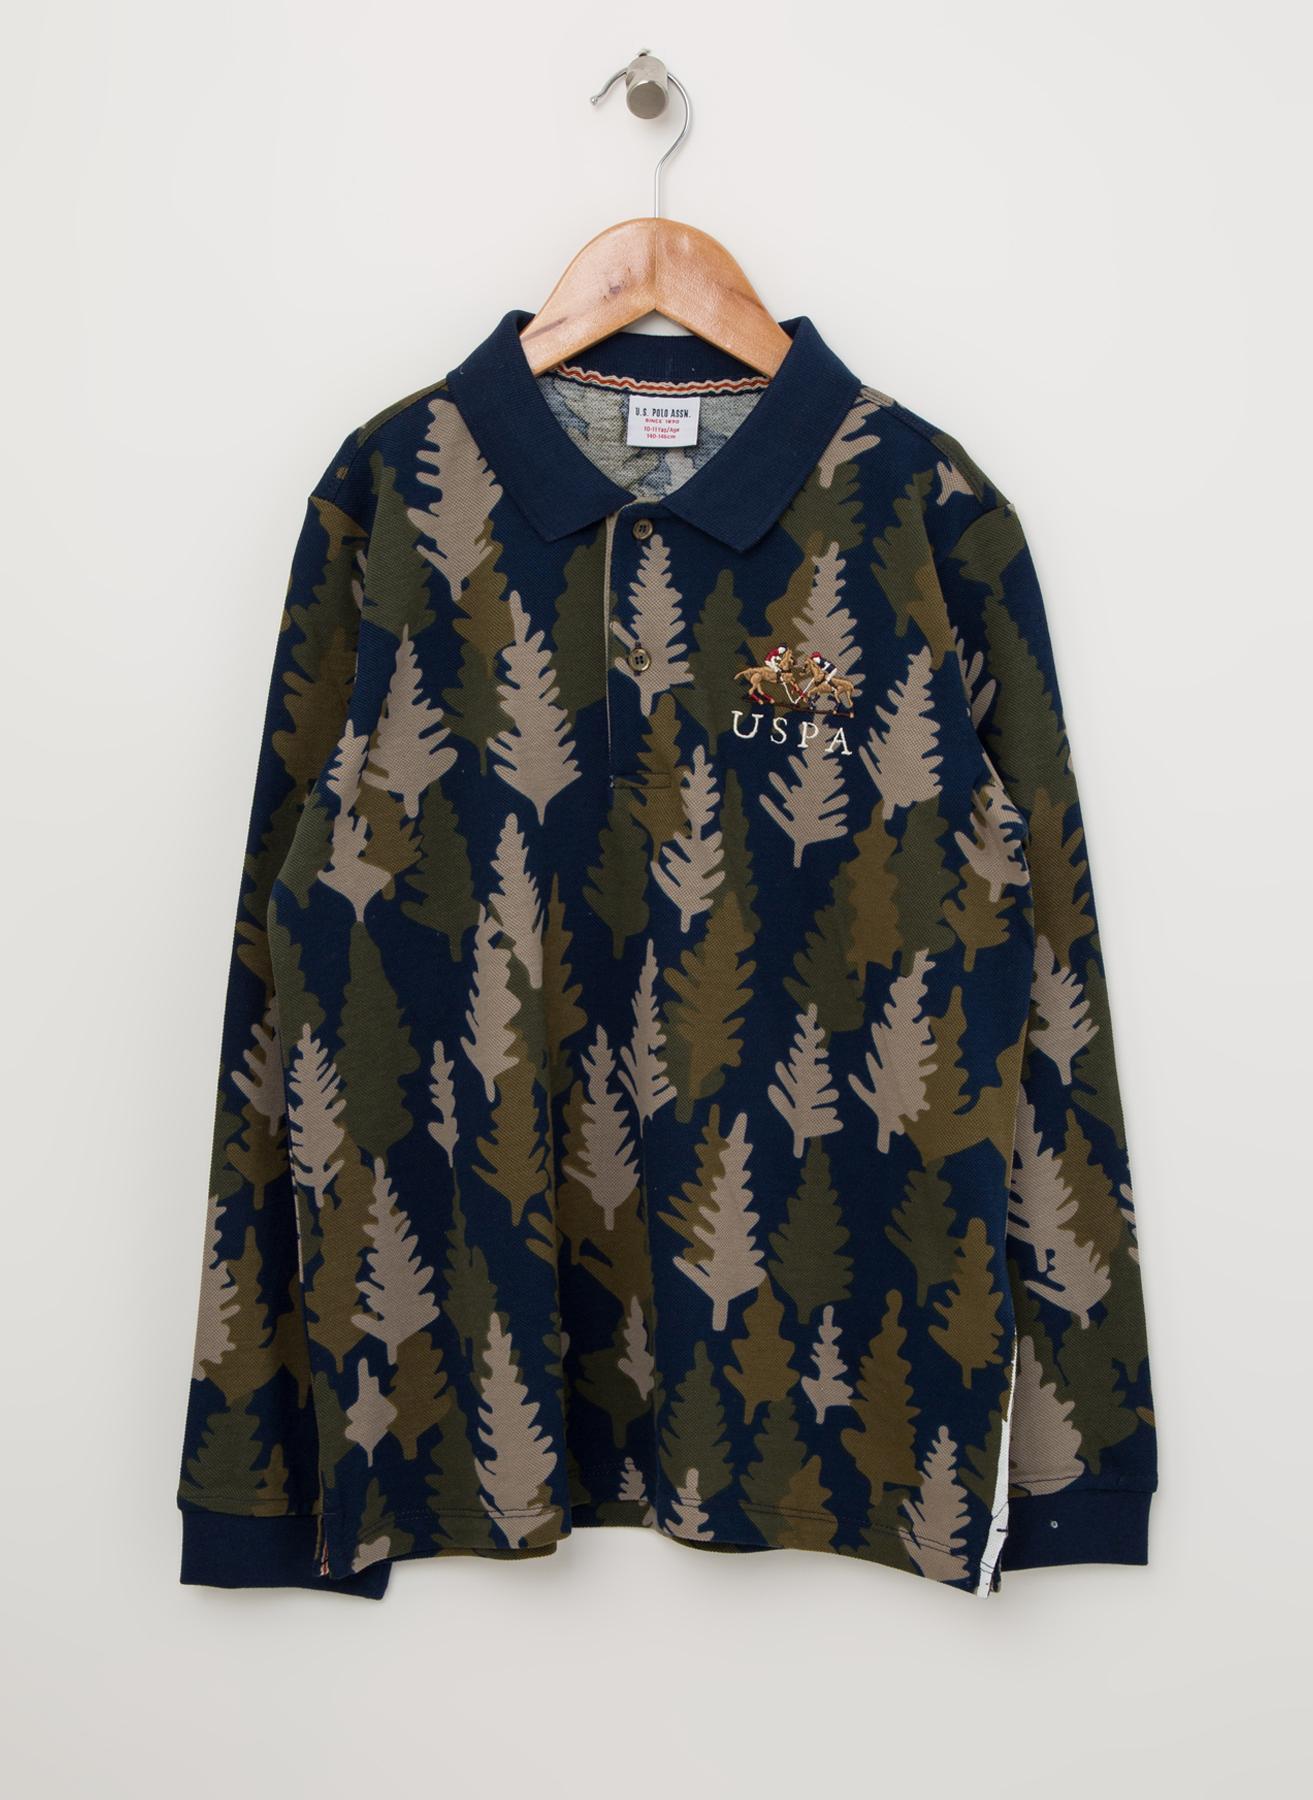 U.S. Polo Assn. Polo Yaka Sweatshirt 4 Yaş 5001704628005 Ürün Resmi